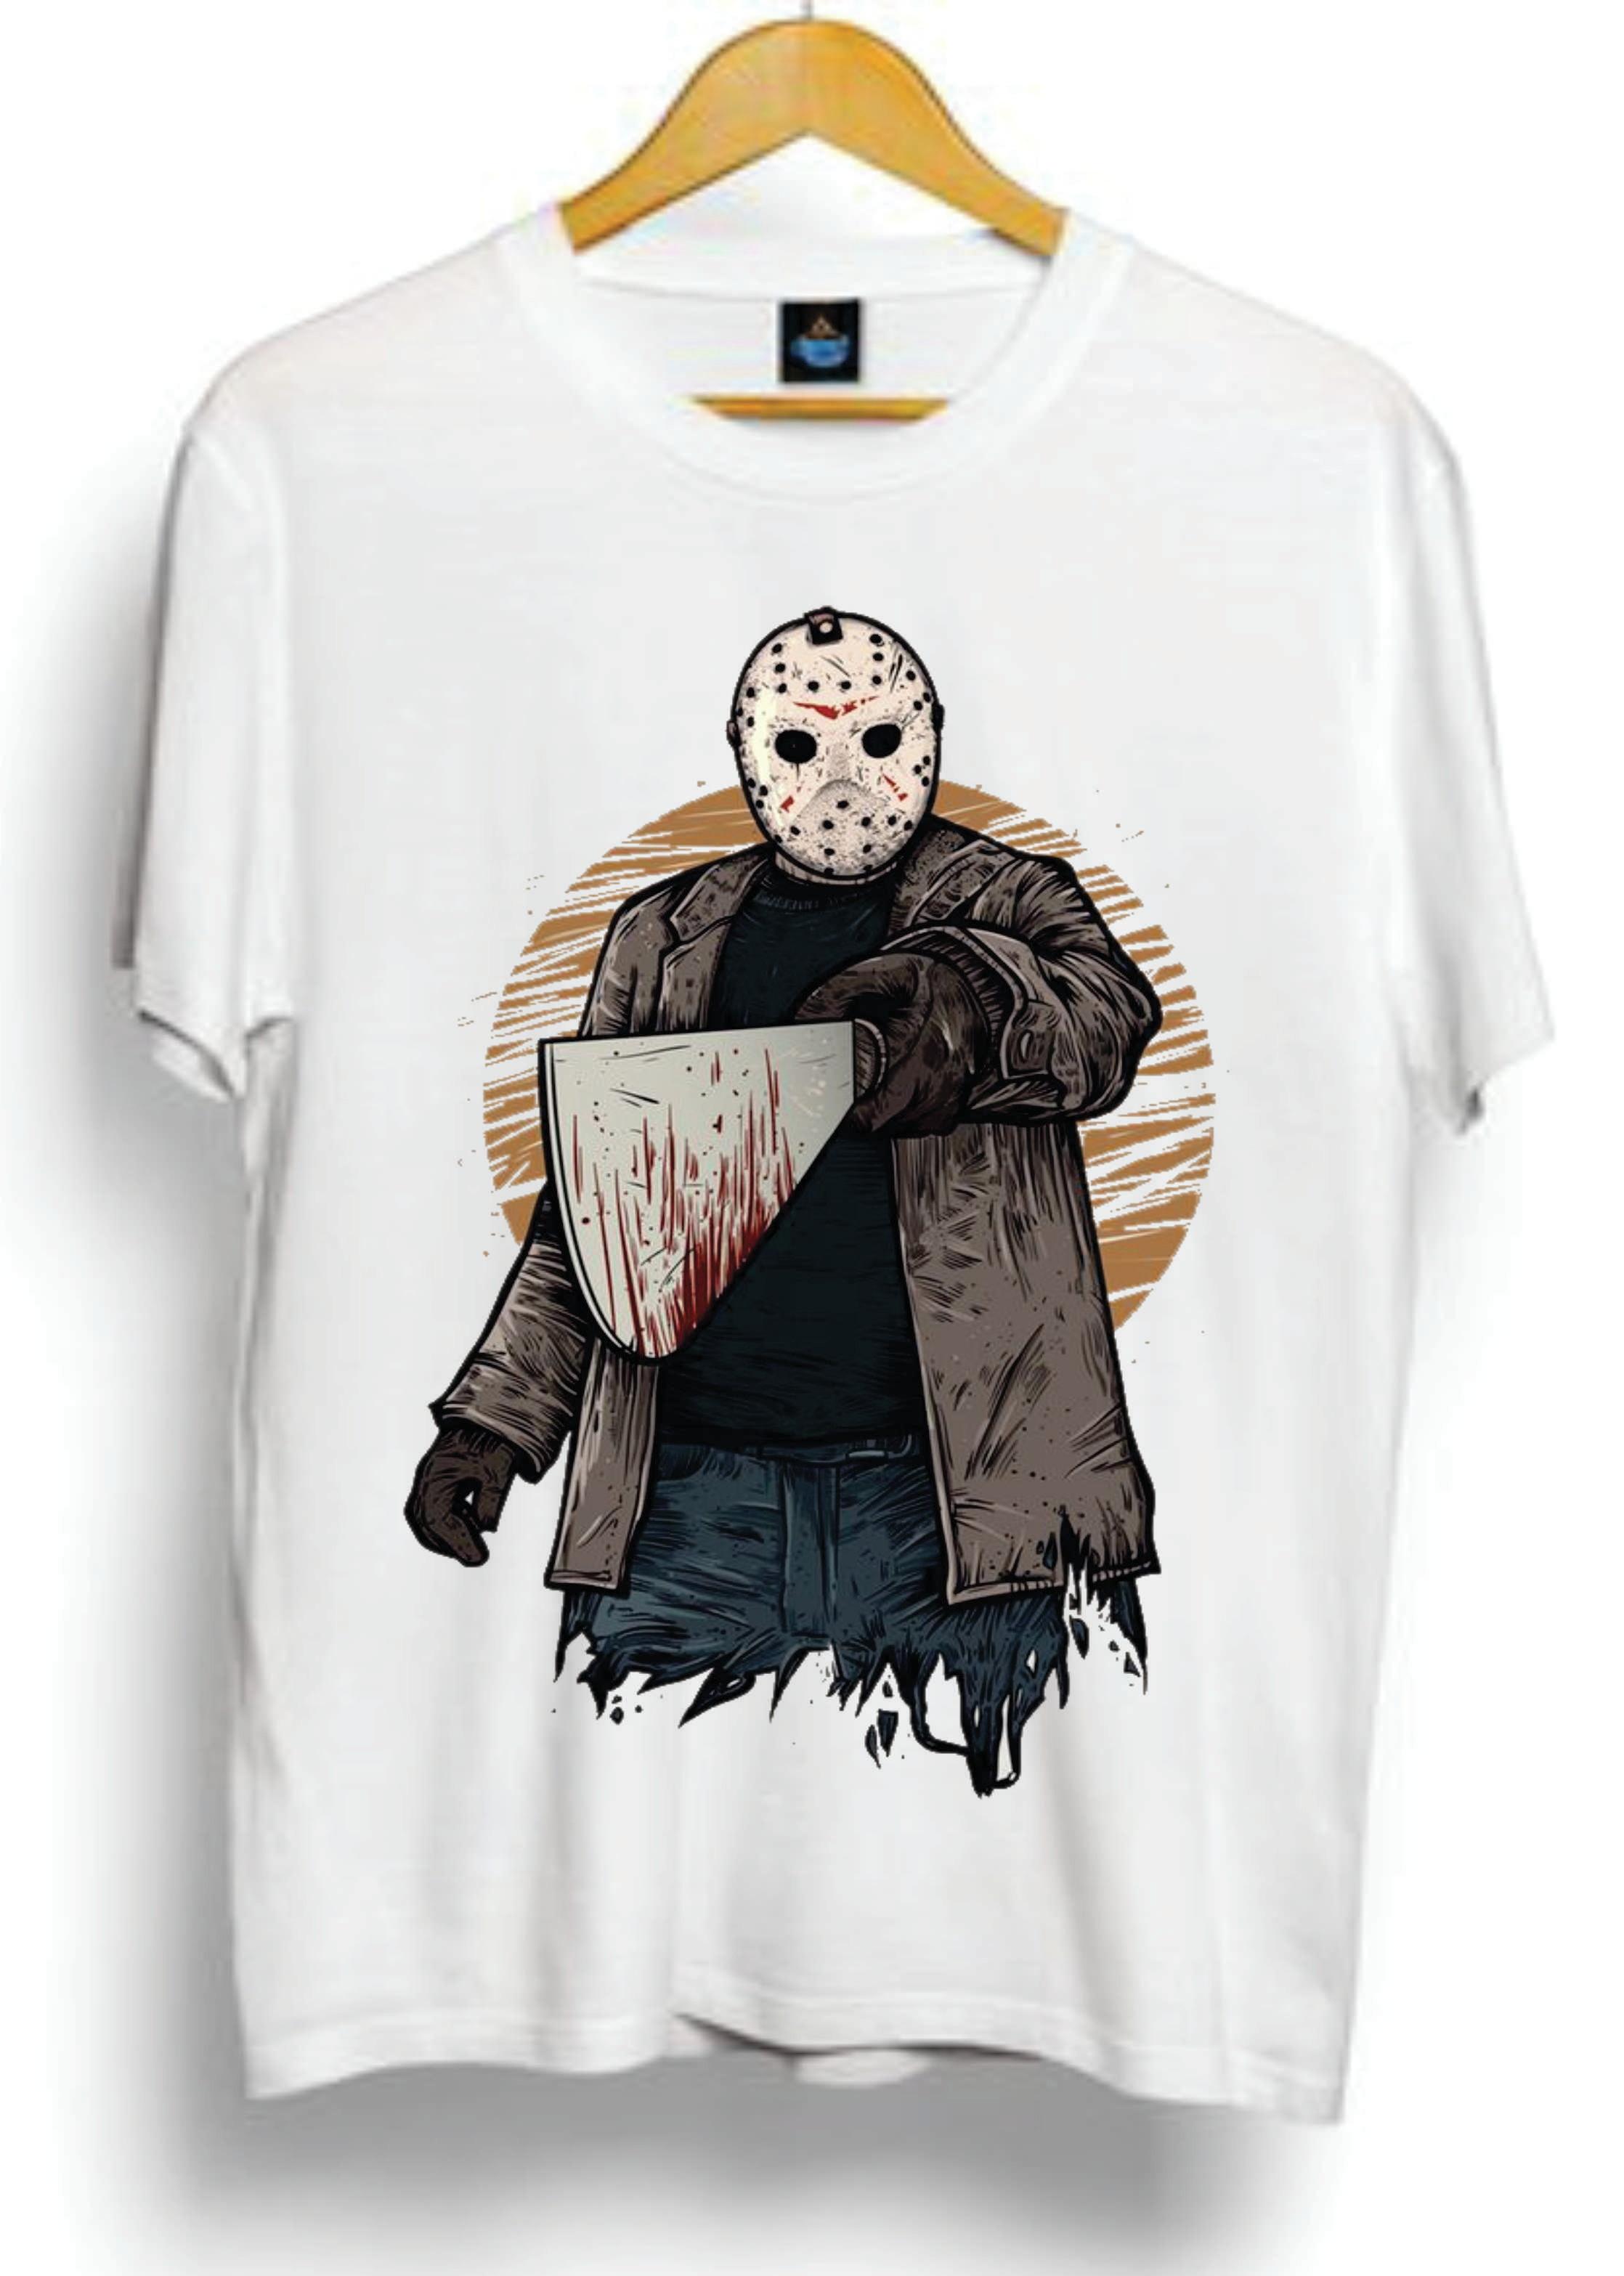 Camiseta Jason Sexta Feira 13 No Elo7 Ousadia 16 O16 E9e3c9